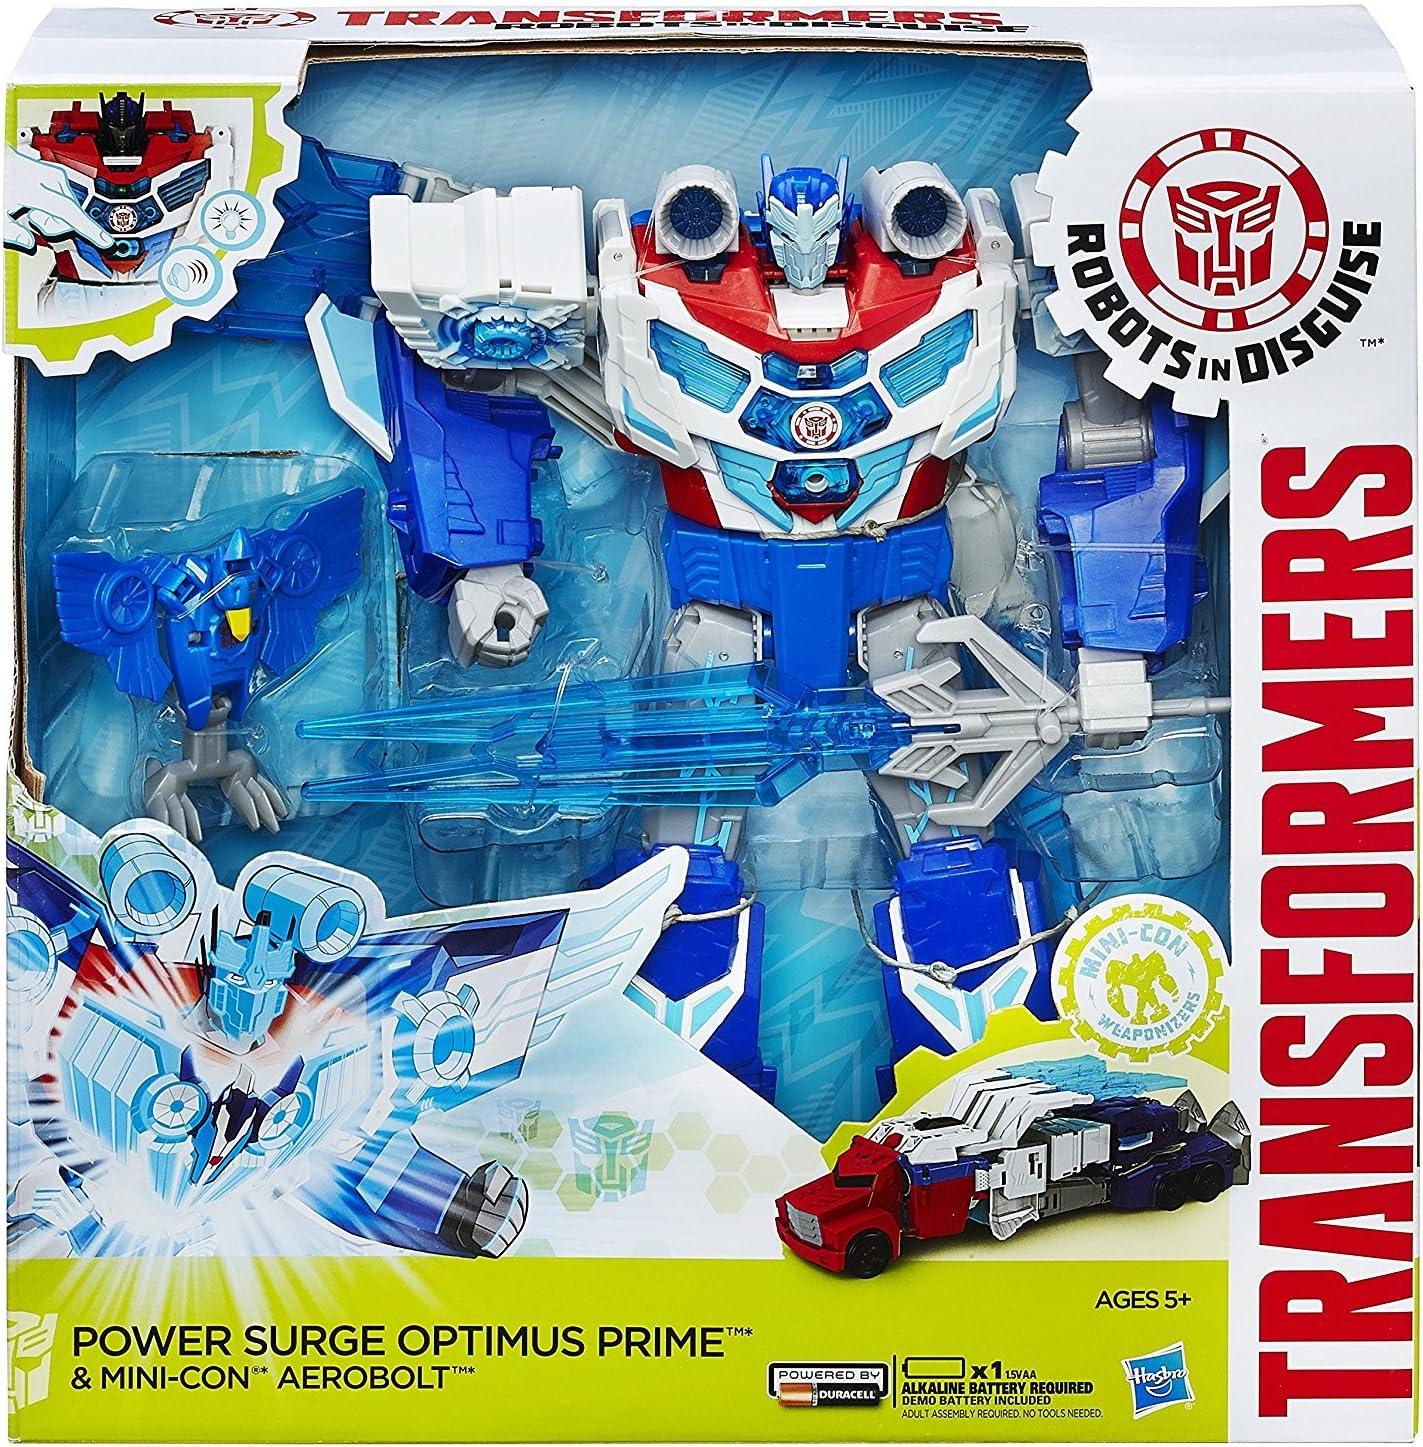 Transformers Robots in Disguise surtension Optimus Prime un aerobolt Figure Toy